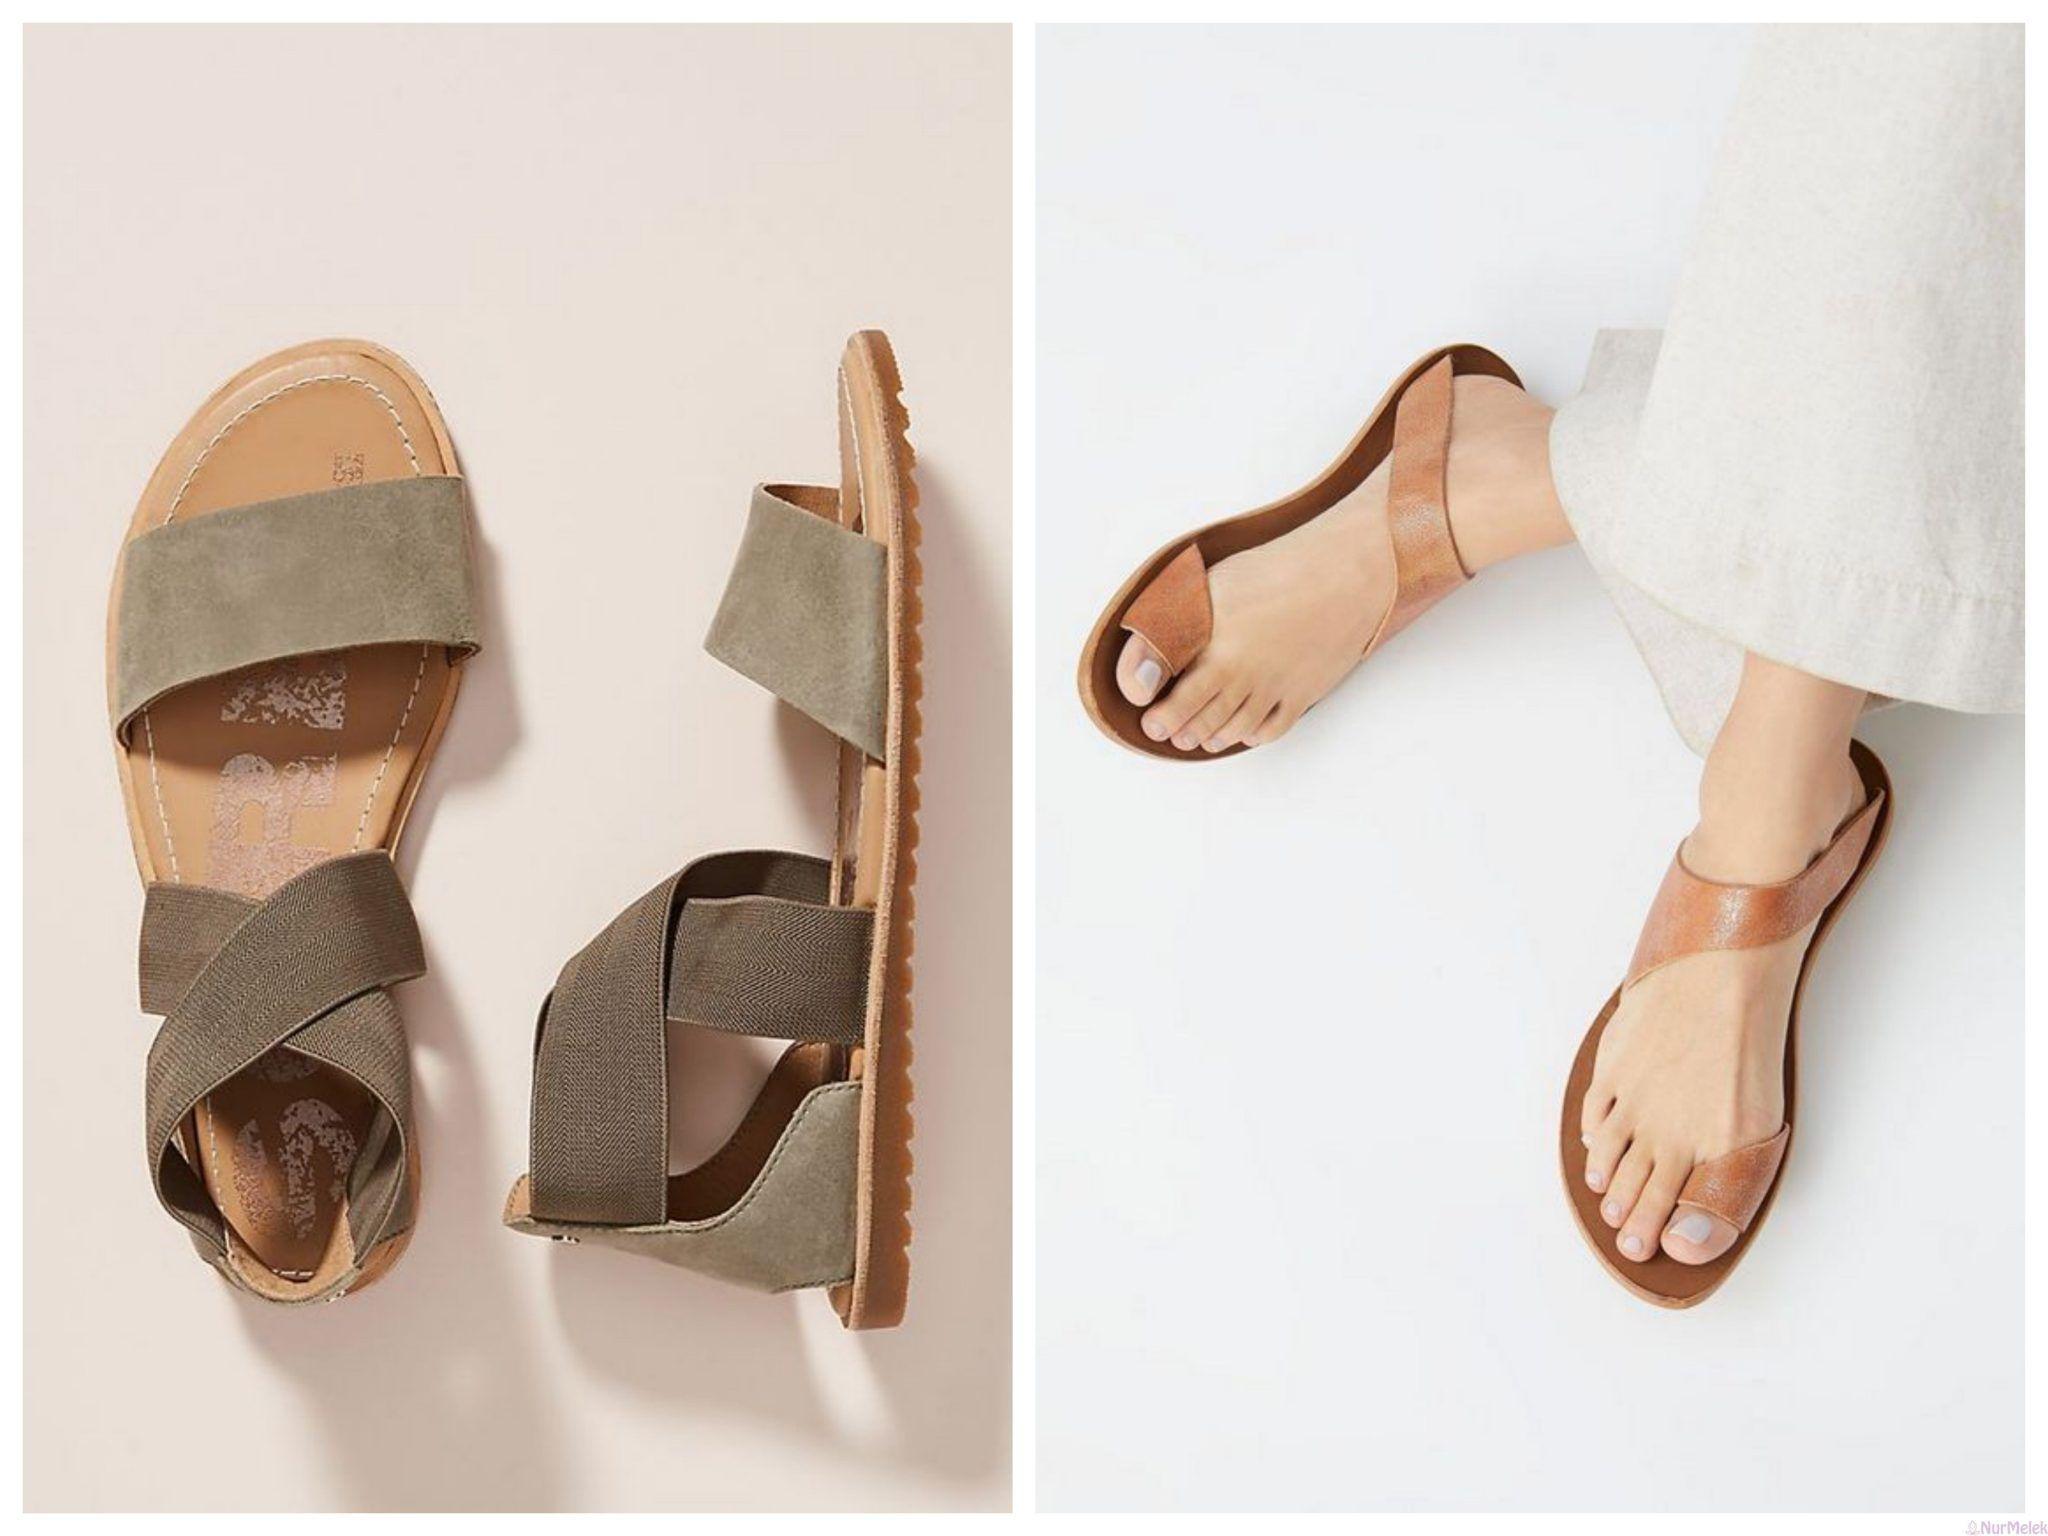 2020 Bayan Sandalet Modelleri Sandalet Siyah Sandalet Topuklu Sandalet